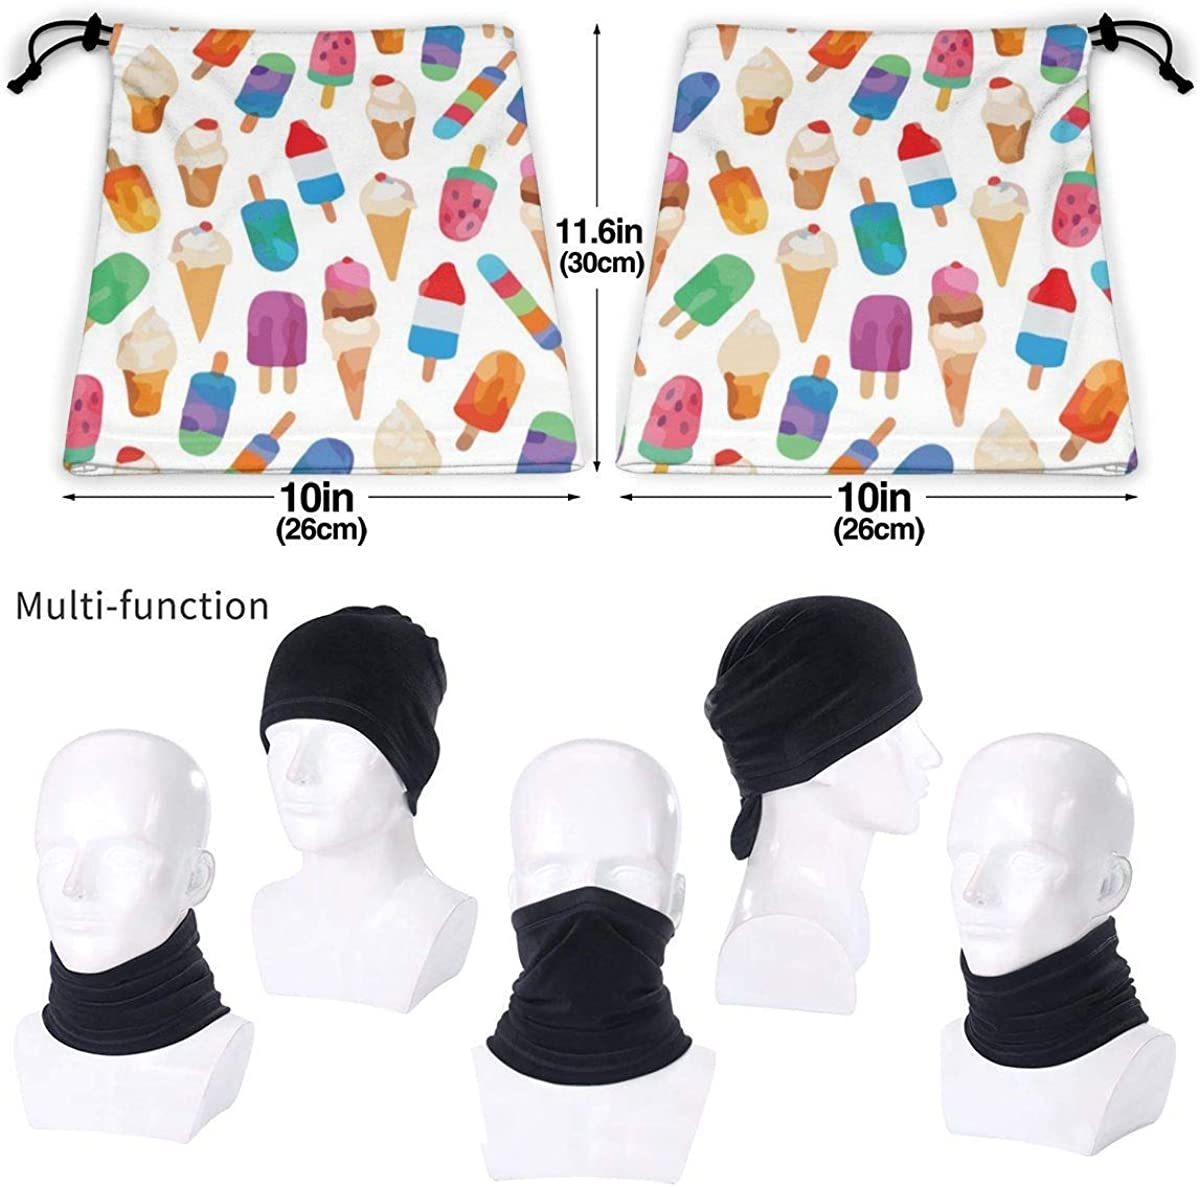 Microfiber Neck Warmer Watercolor Summer Ice Creams Neck Gaiter Tube Ear Warmer Headband Scarf Face Mask Balaclava